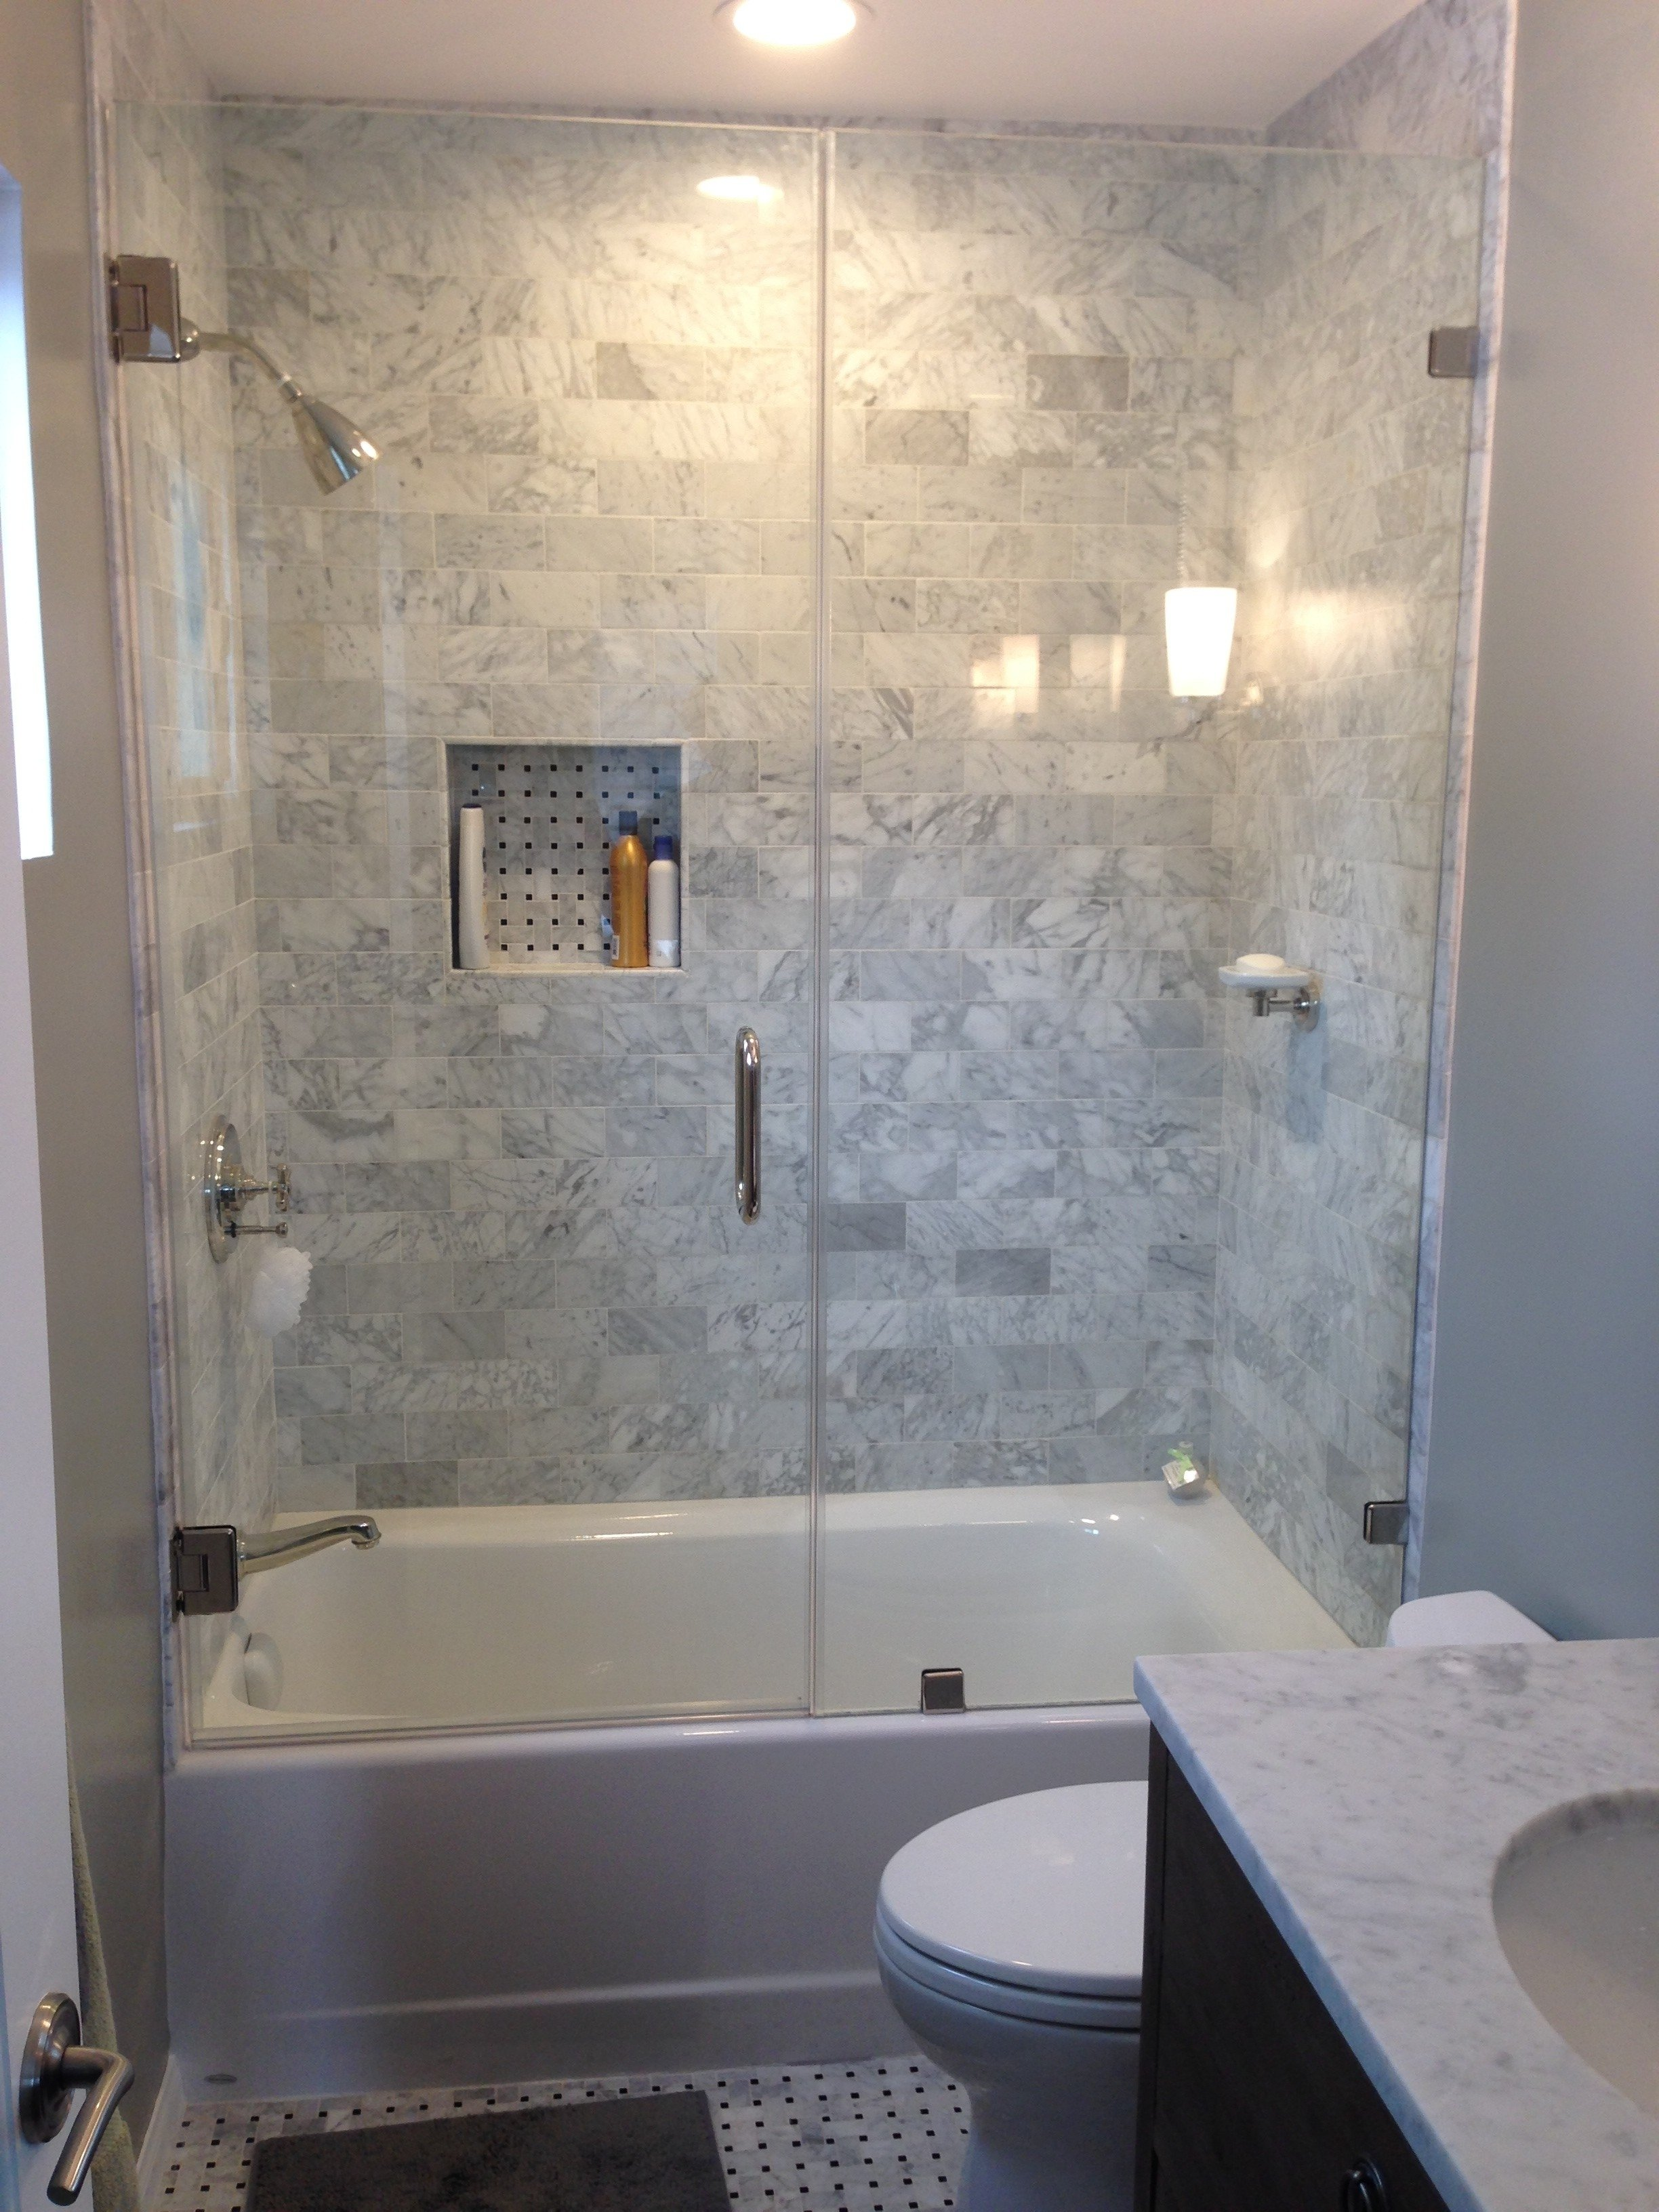 10 Unique Tile Ideas For Small Bathroom bathroom tile ideas for small bathrooms room design ideas 2020